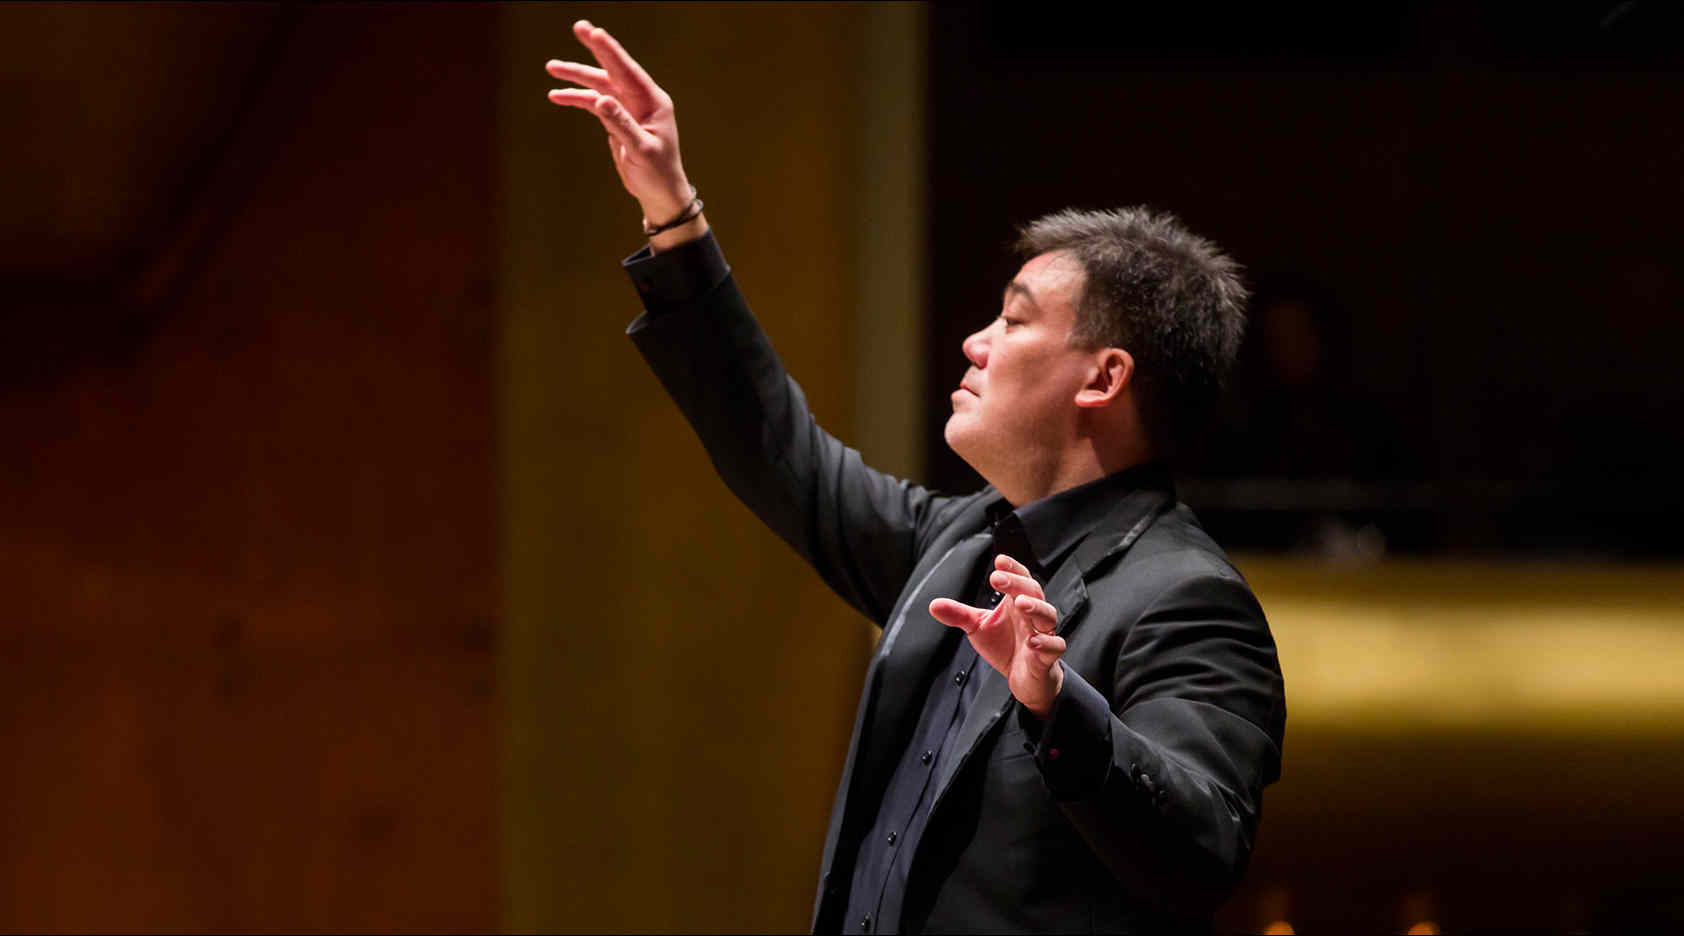 Gilbert Conducts Wagner's <em>Das Rheingold</em>